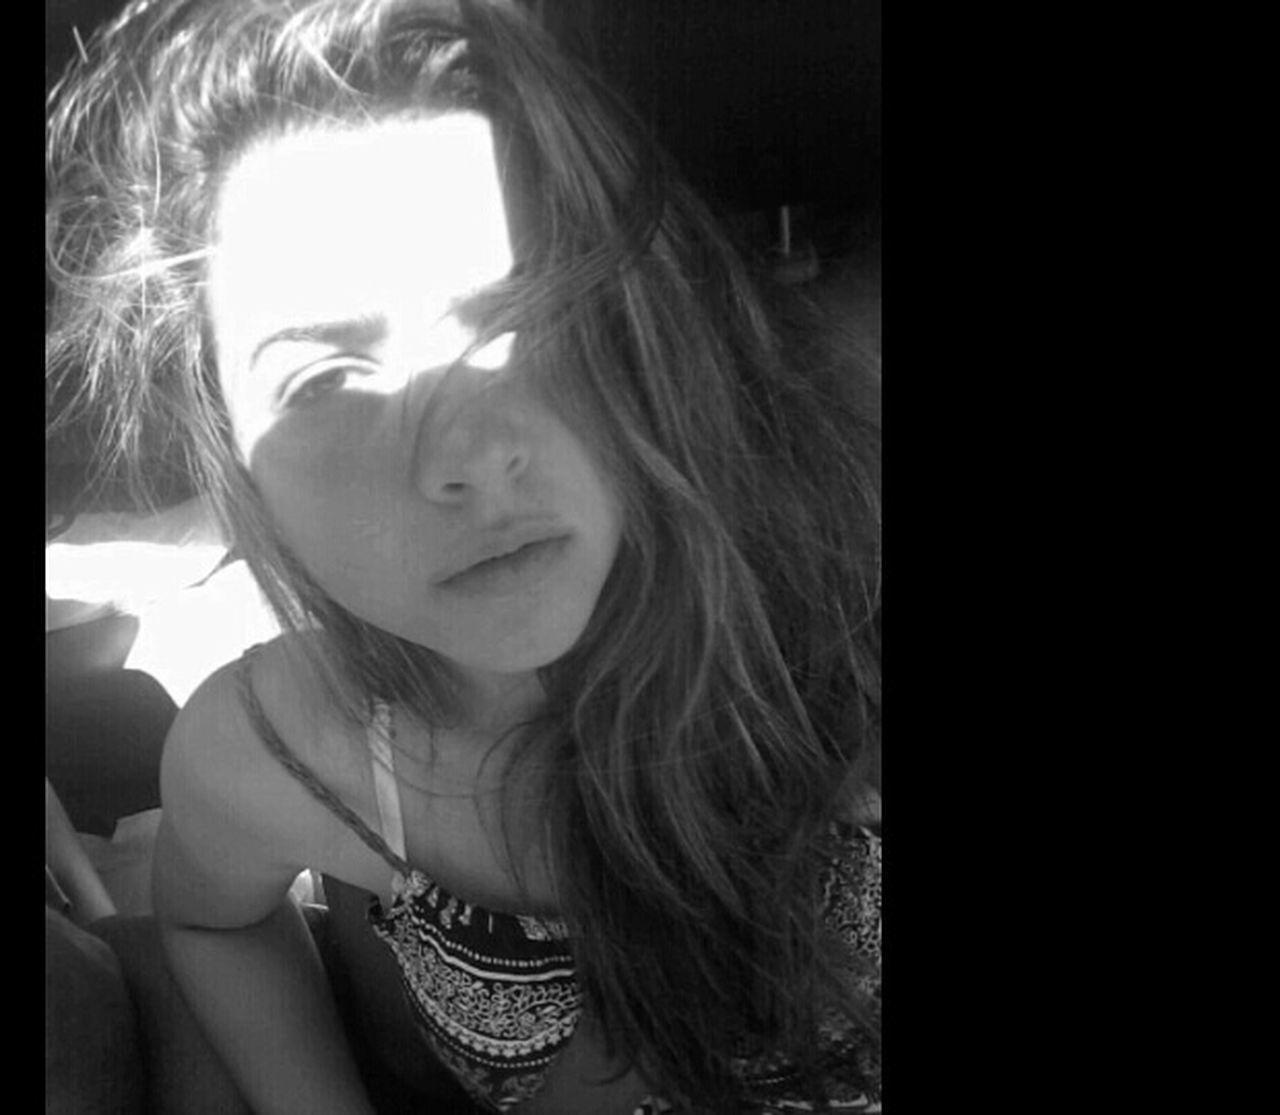 A Girls Chica Sol Verano Kiasorento First Eyeem Photo